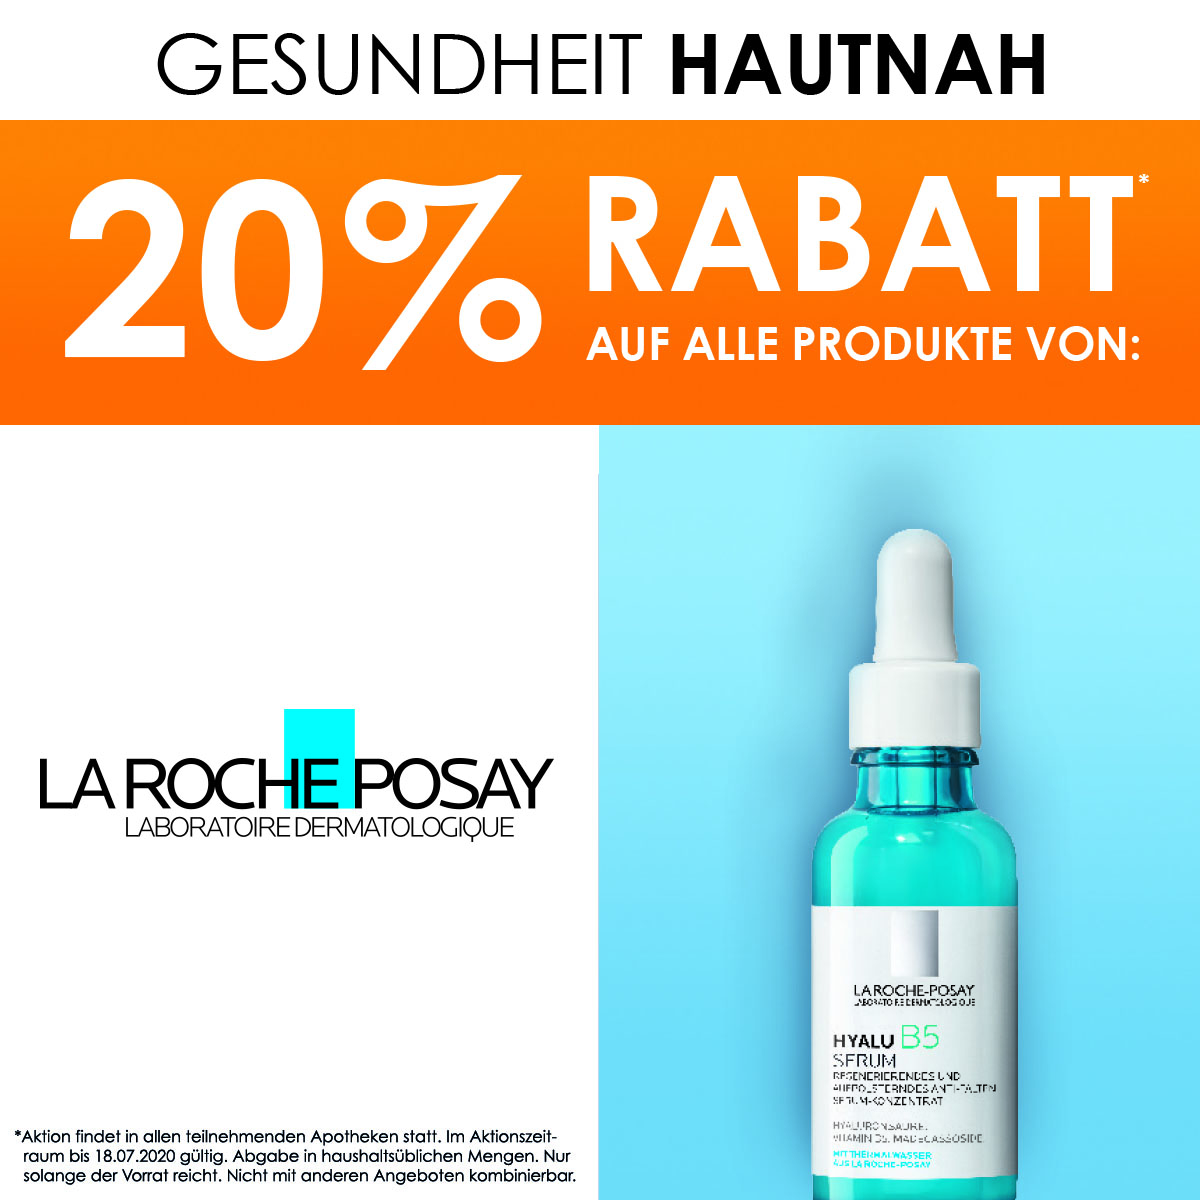 20% Rabatt auf LaRochePosay